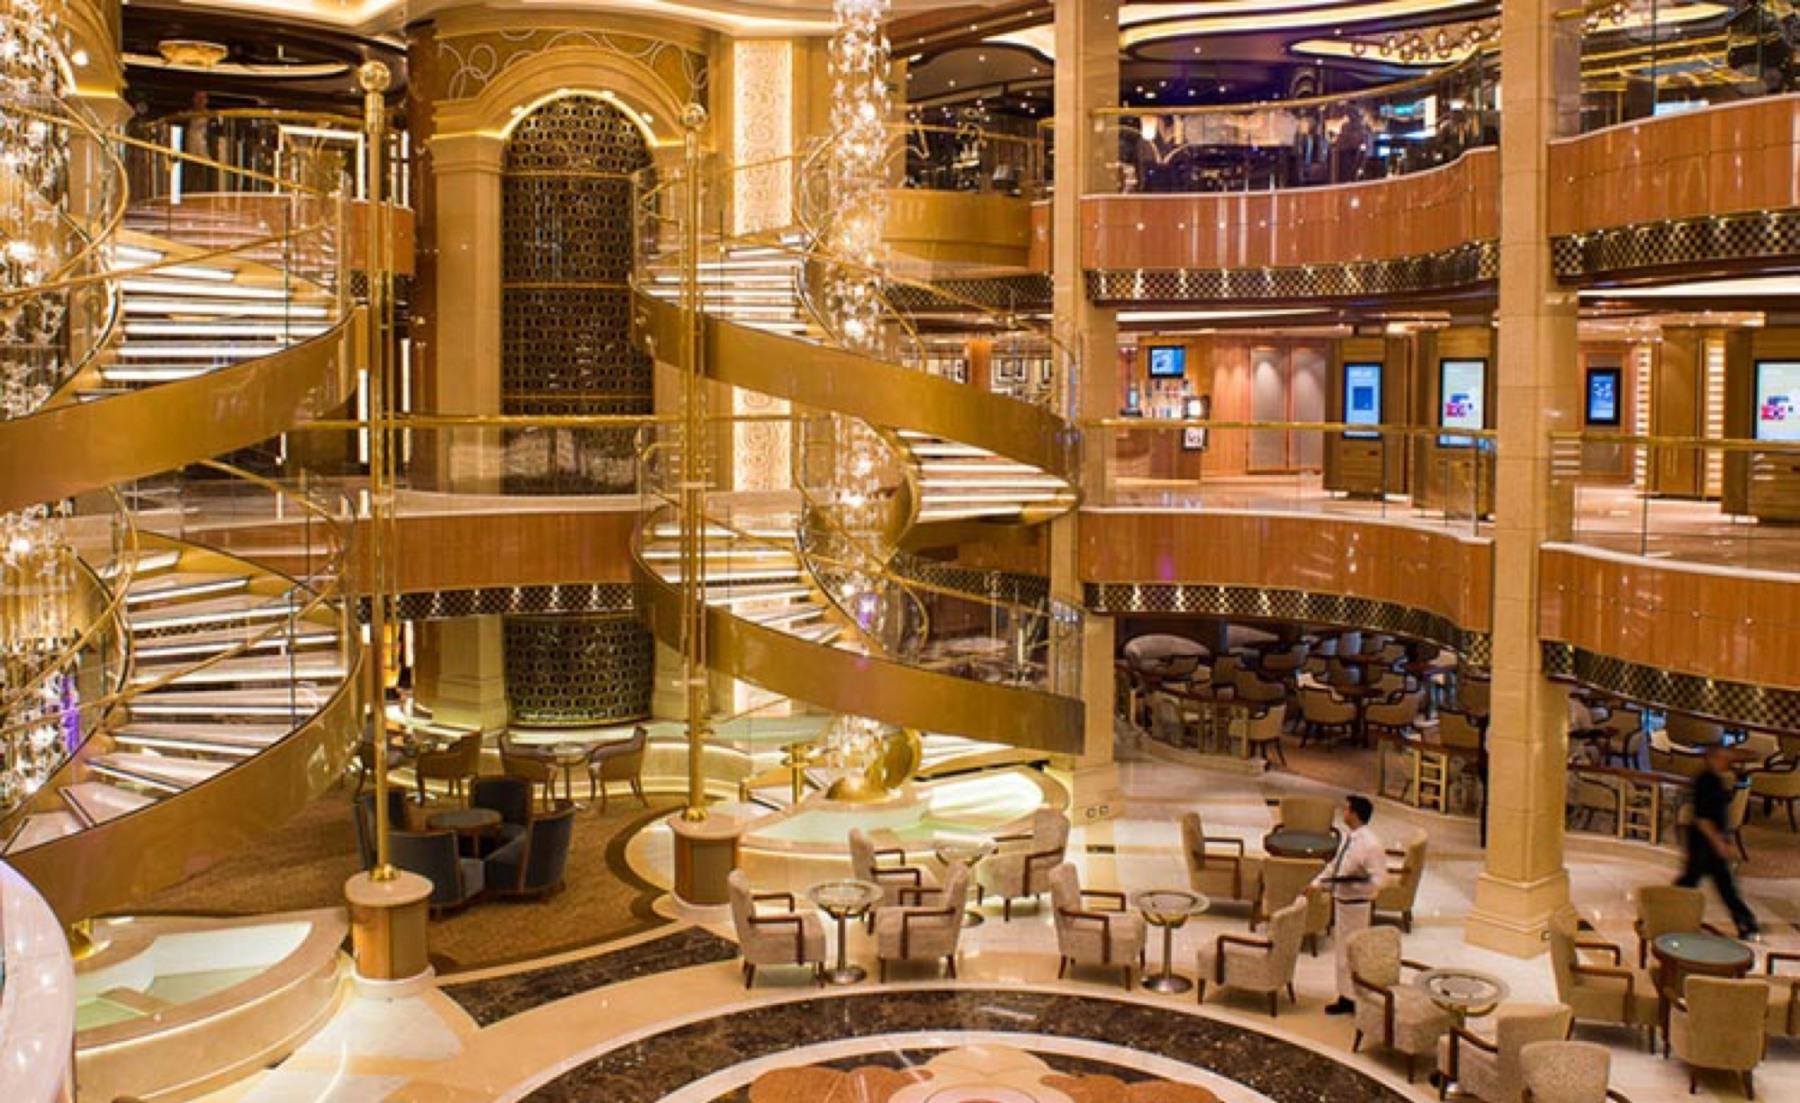 Princess Cruises Royal Class Interior piazza.jpg